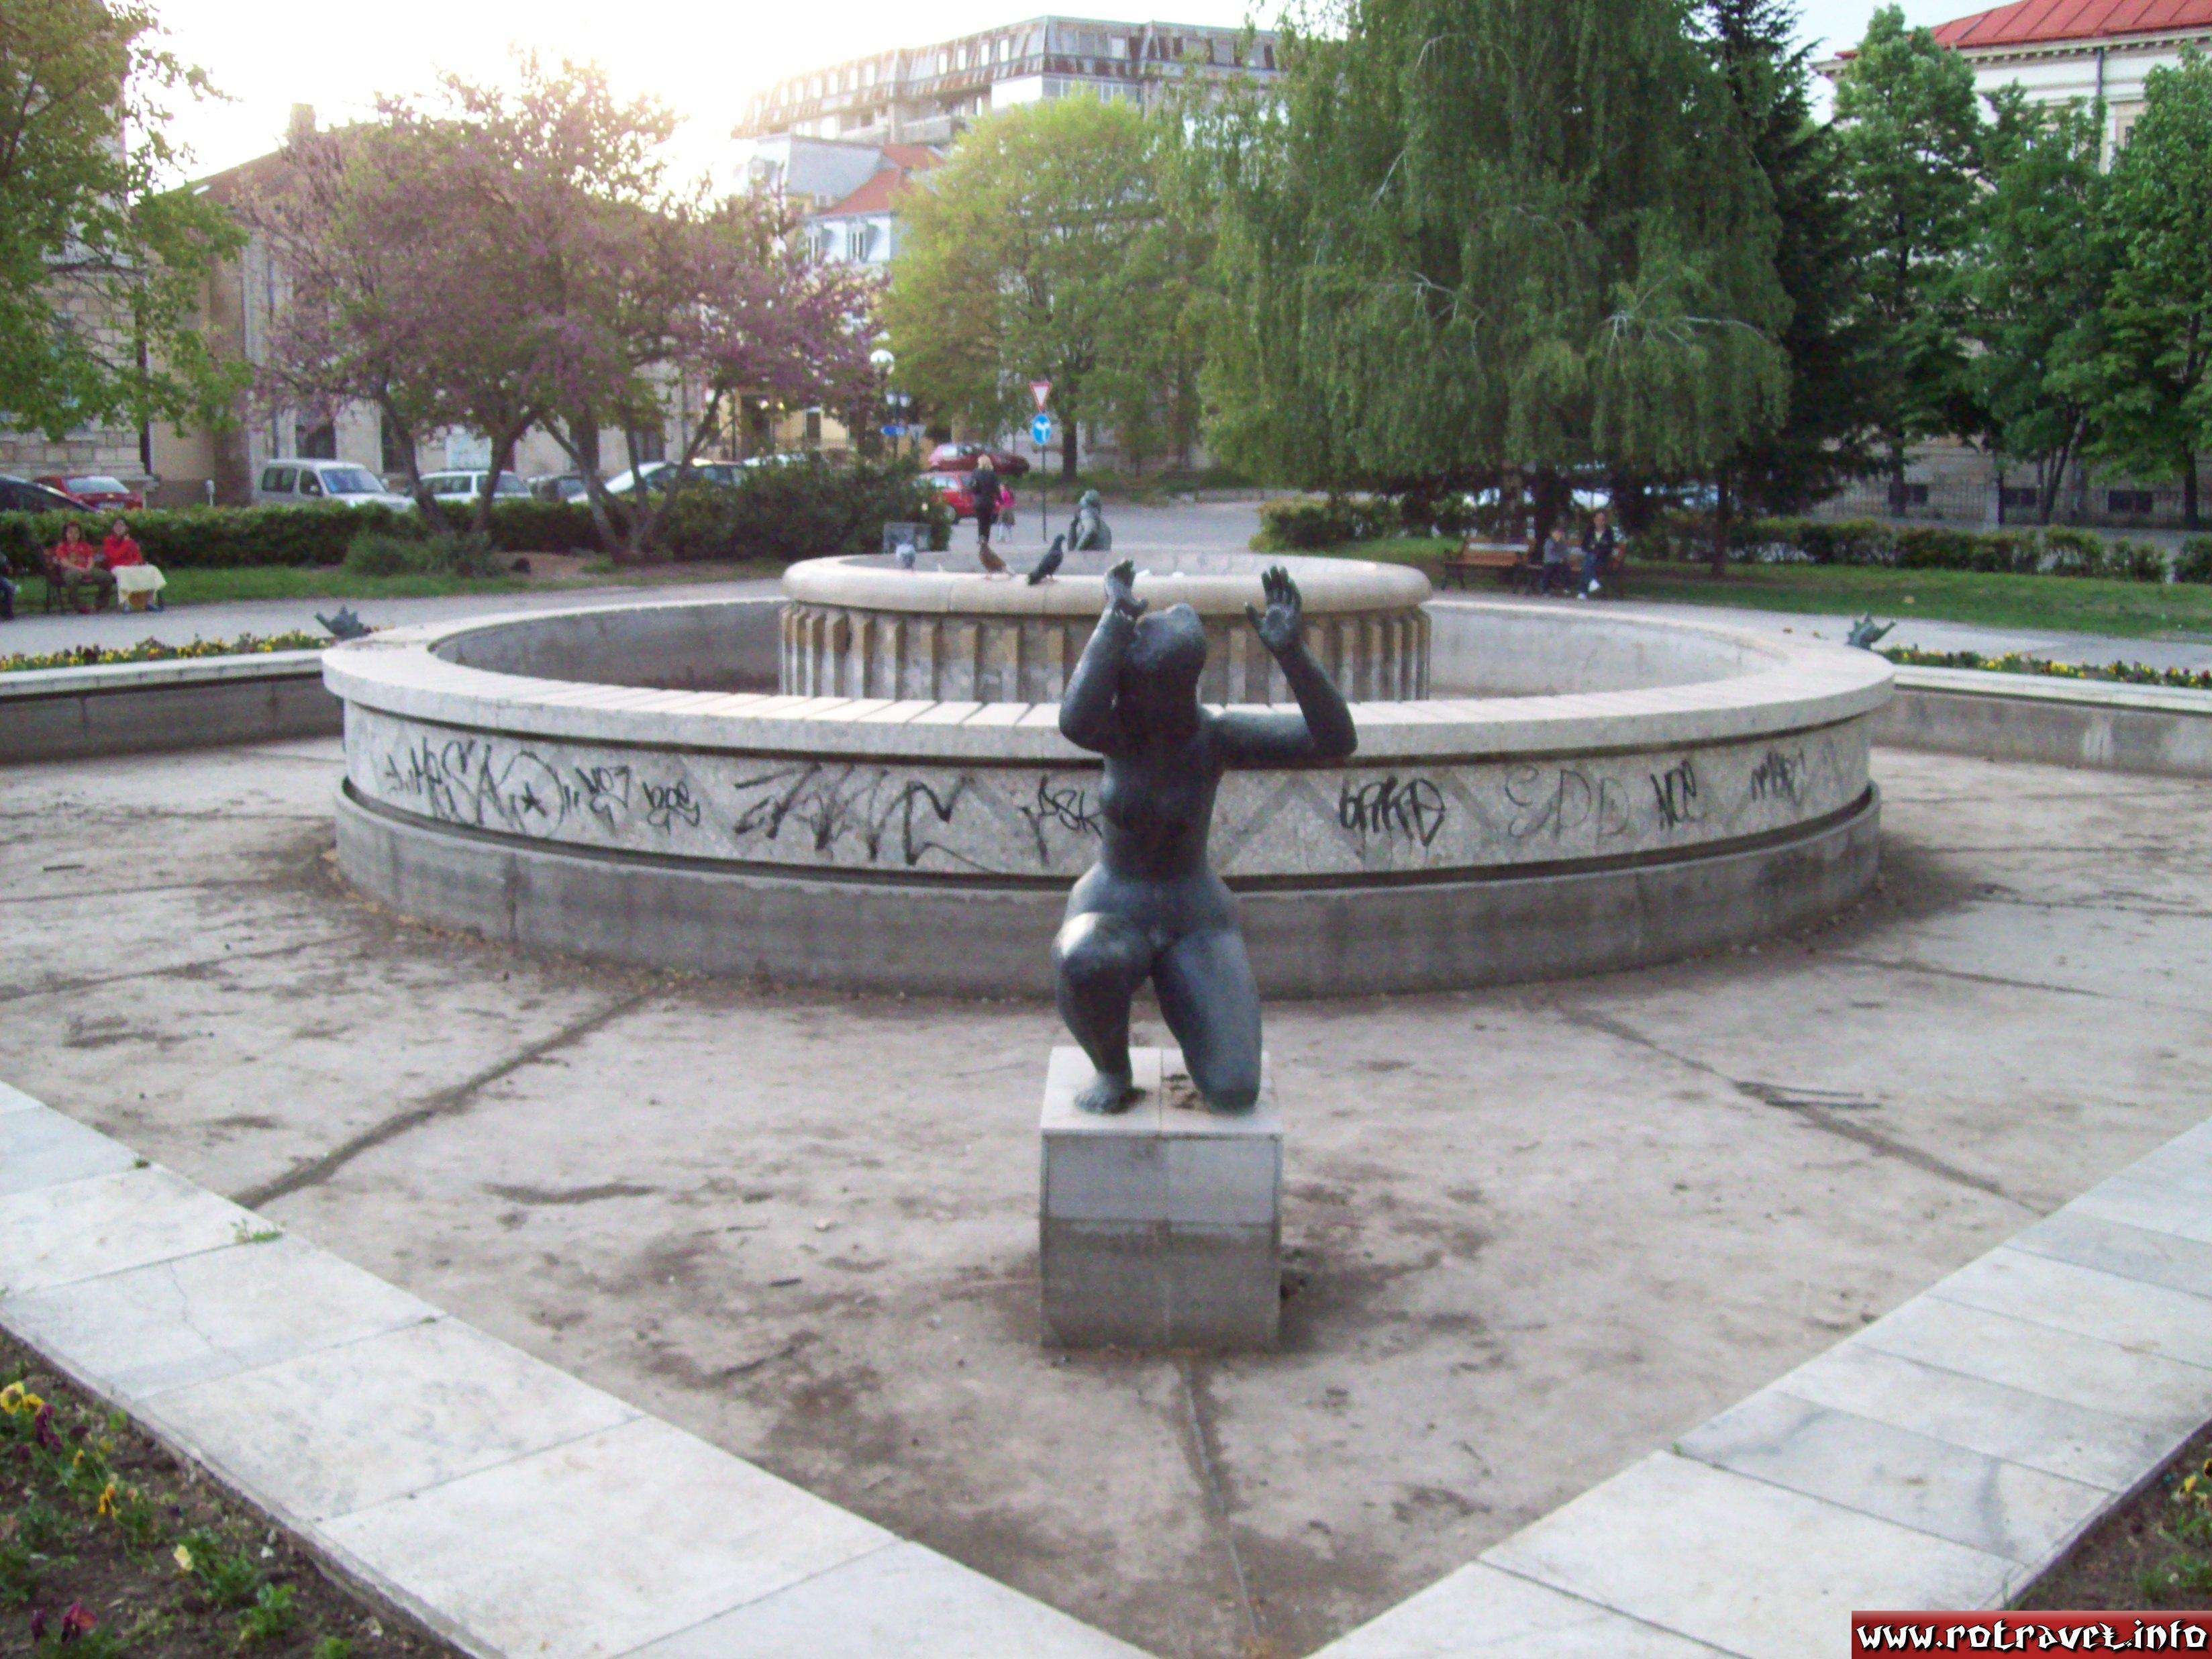 Other strange statue